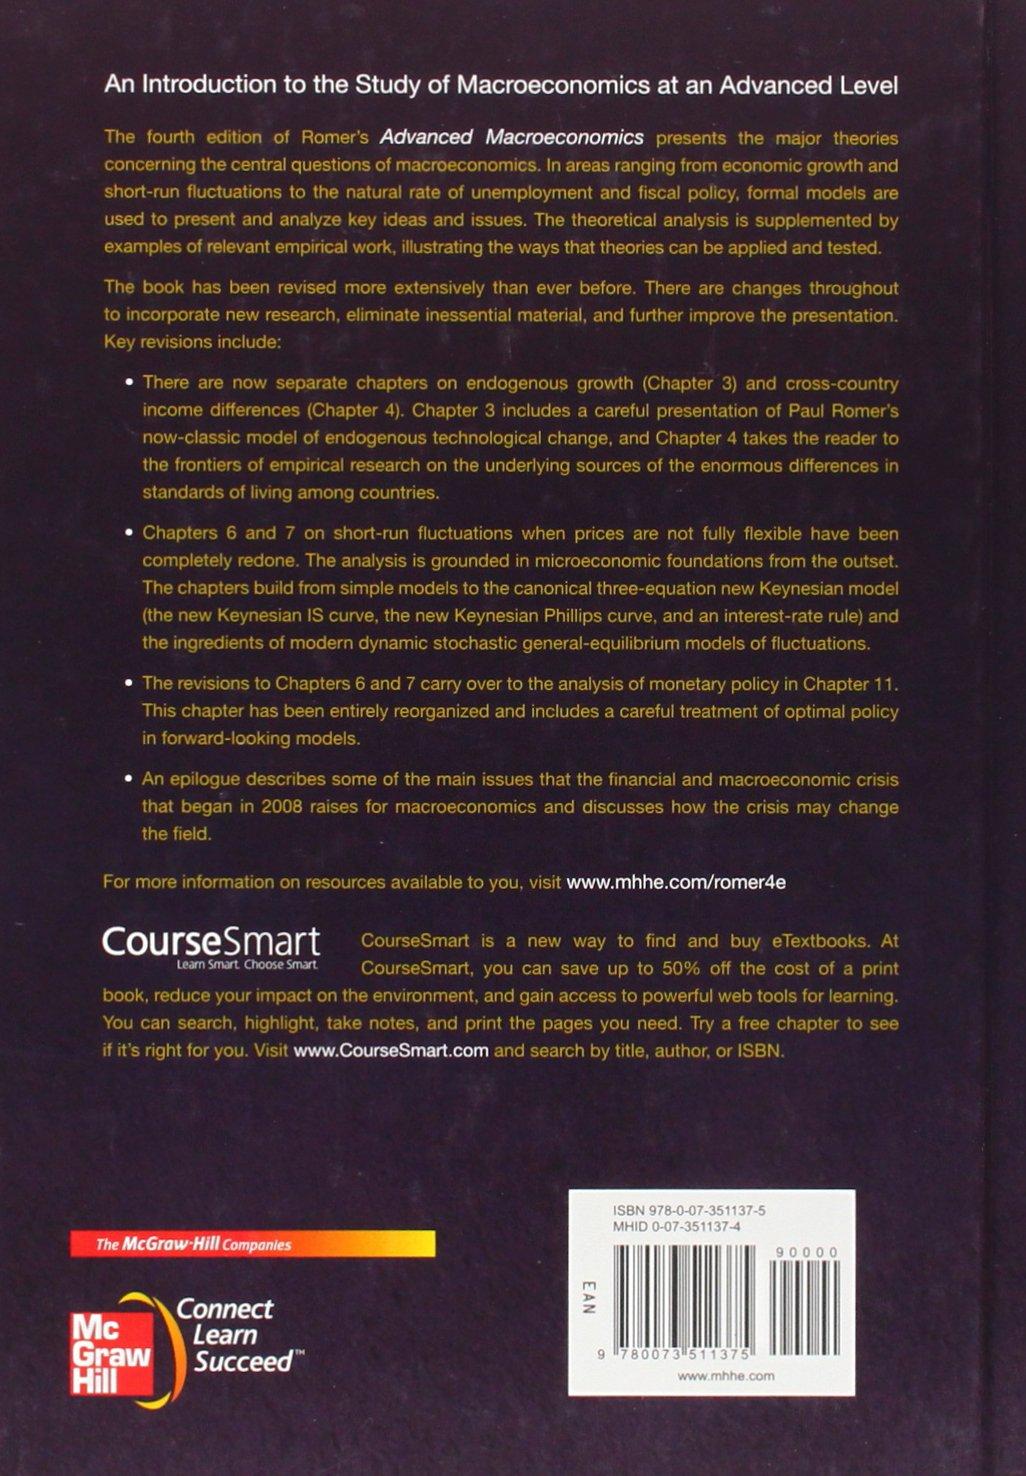 Buy advanced macroeconomics the mcgraw hill series in economics buy advanced macroeconomics the mcgraw hill series in economics book online at low prices in india advanced macroeconomics the mcgraw hill series in fandeluxe Images